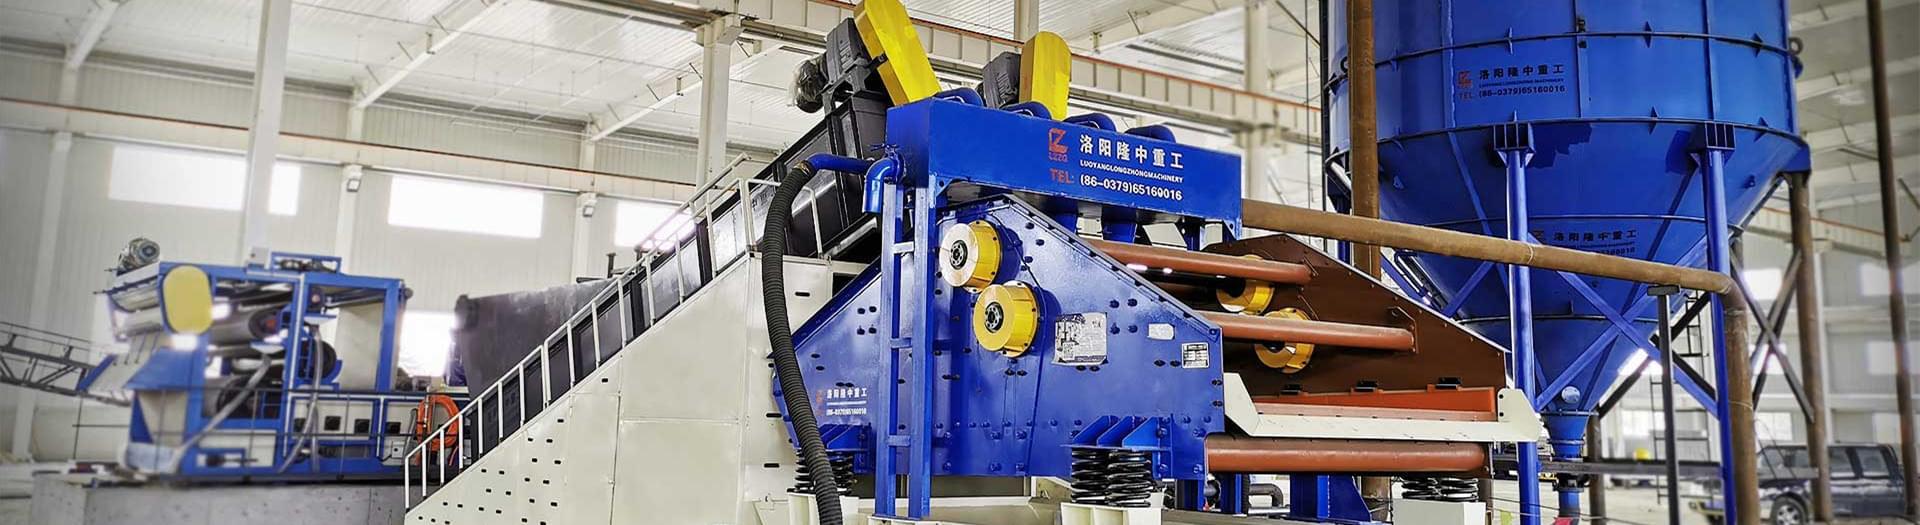 Sand Processing Equipment